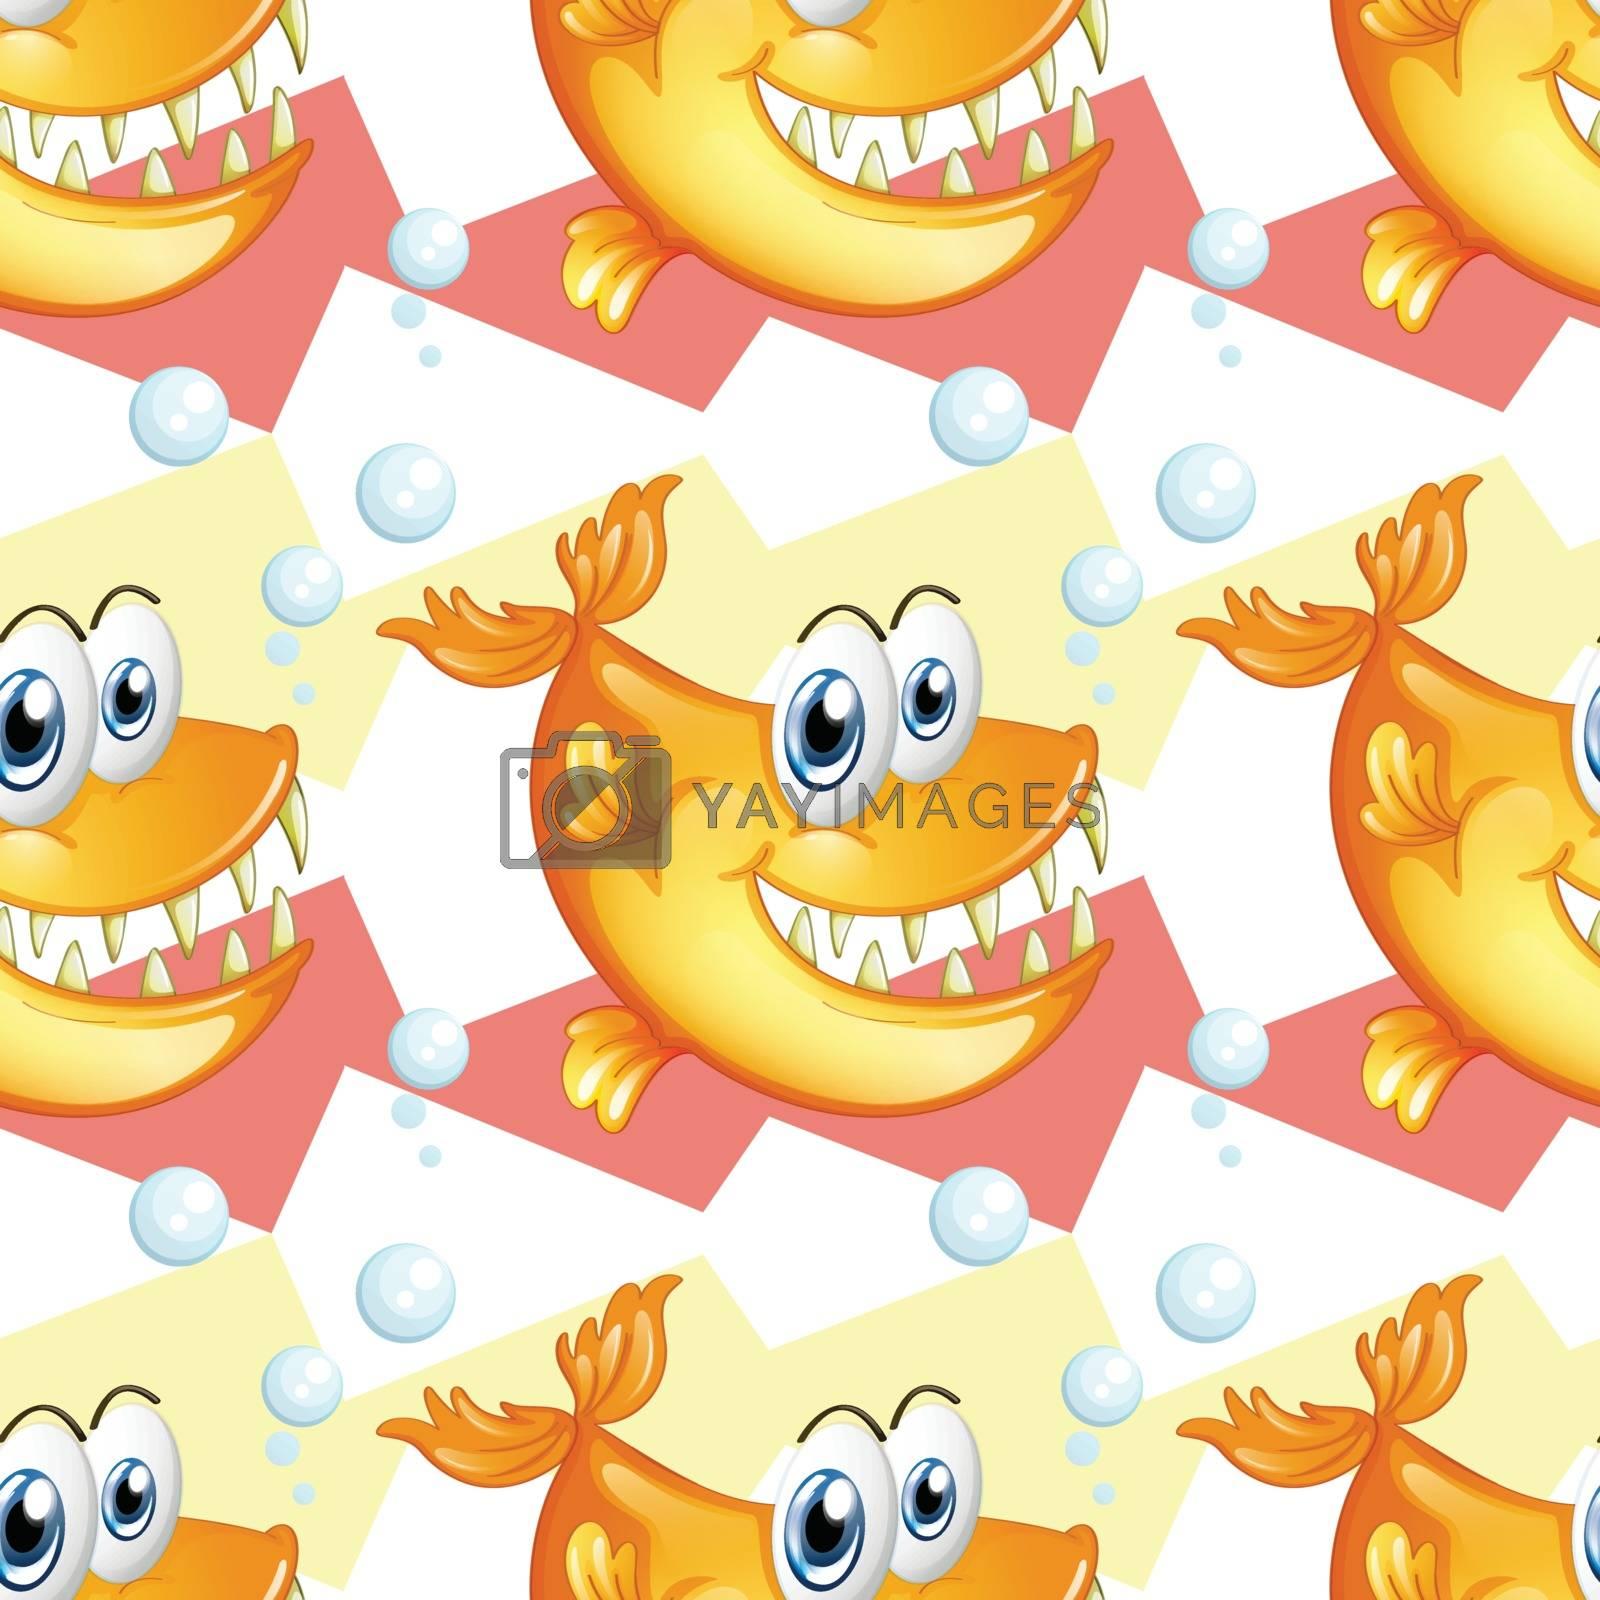 Illustration of the big smiling piranhas on a white background